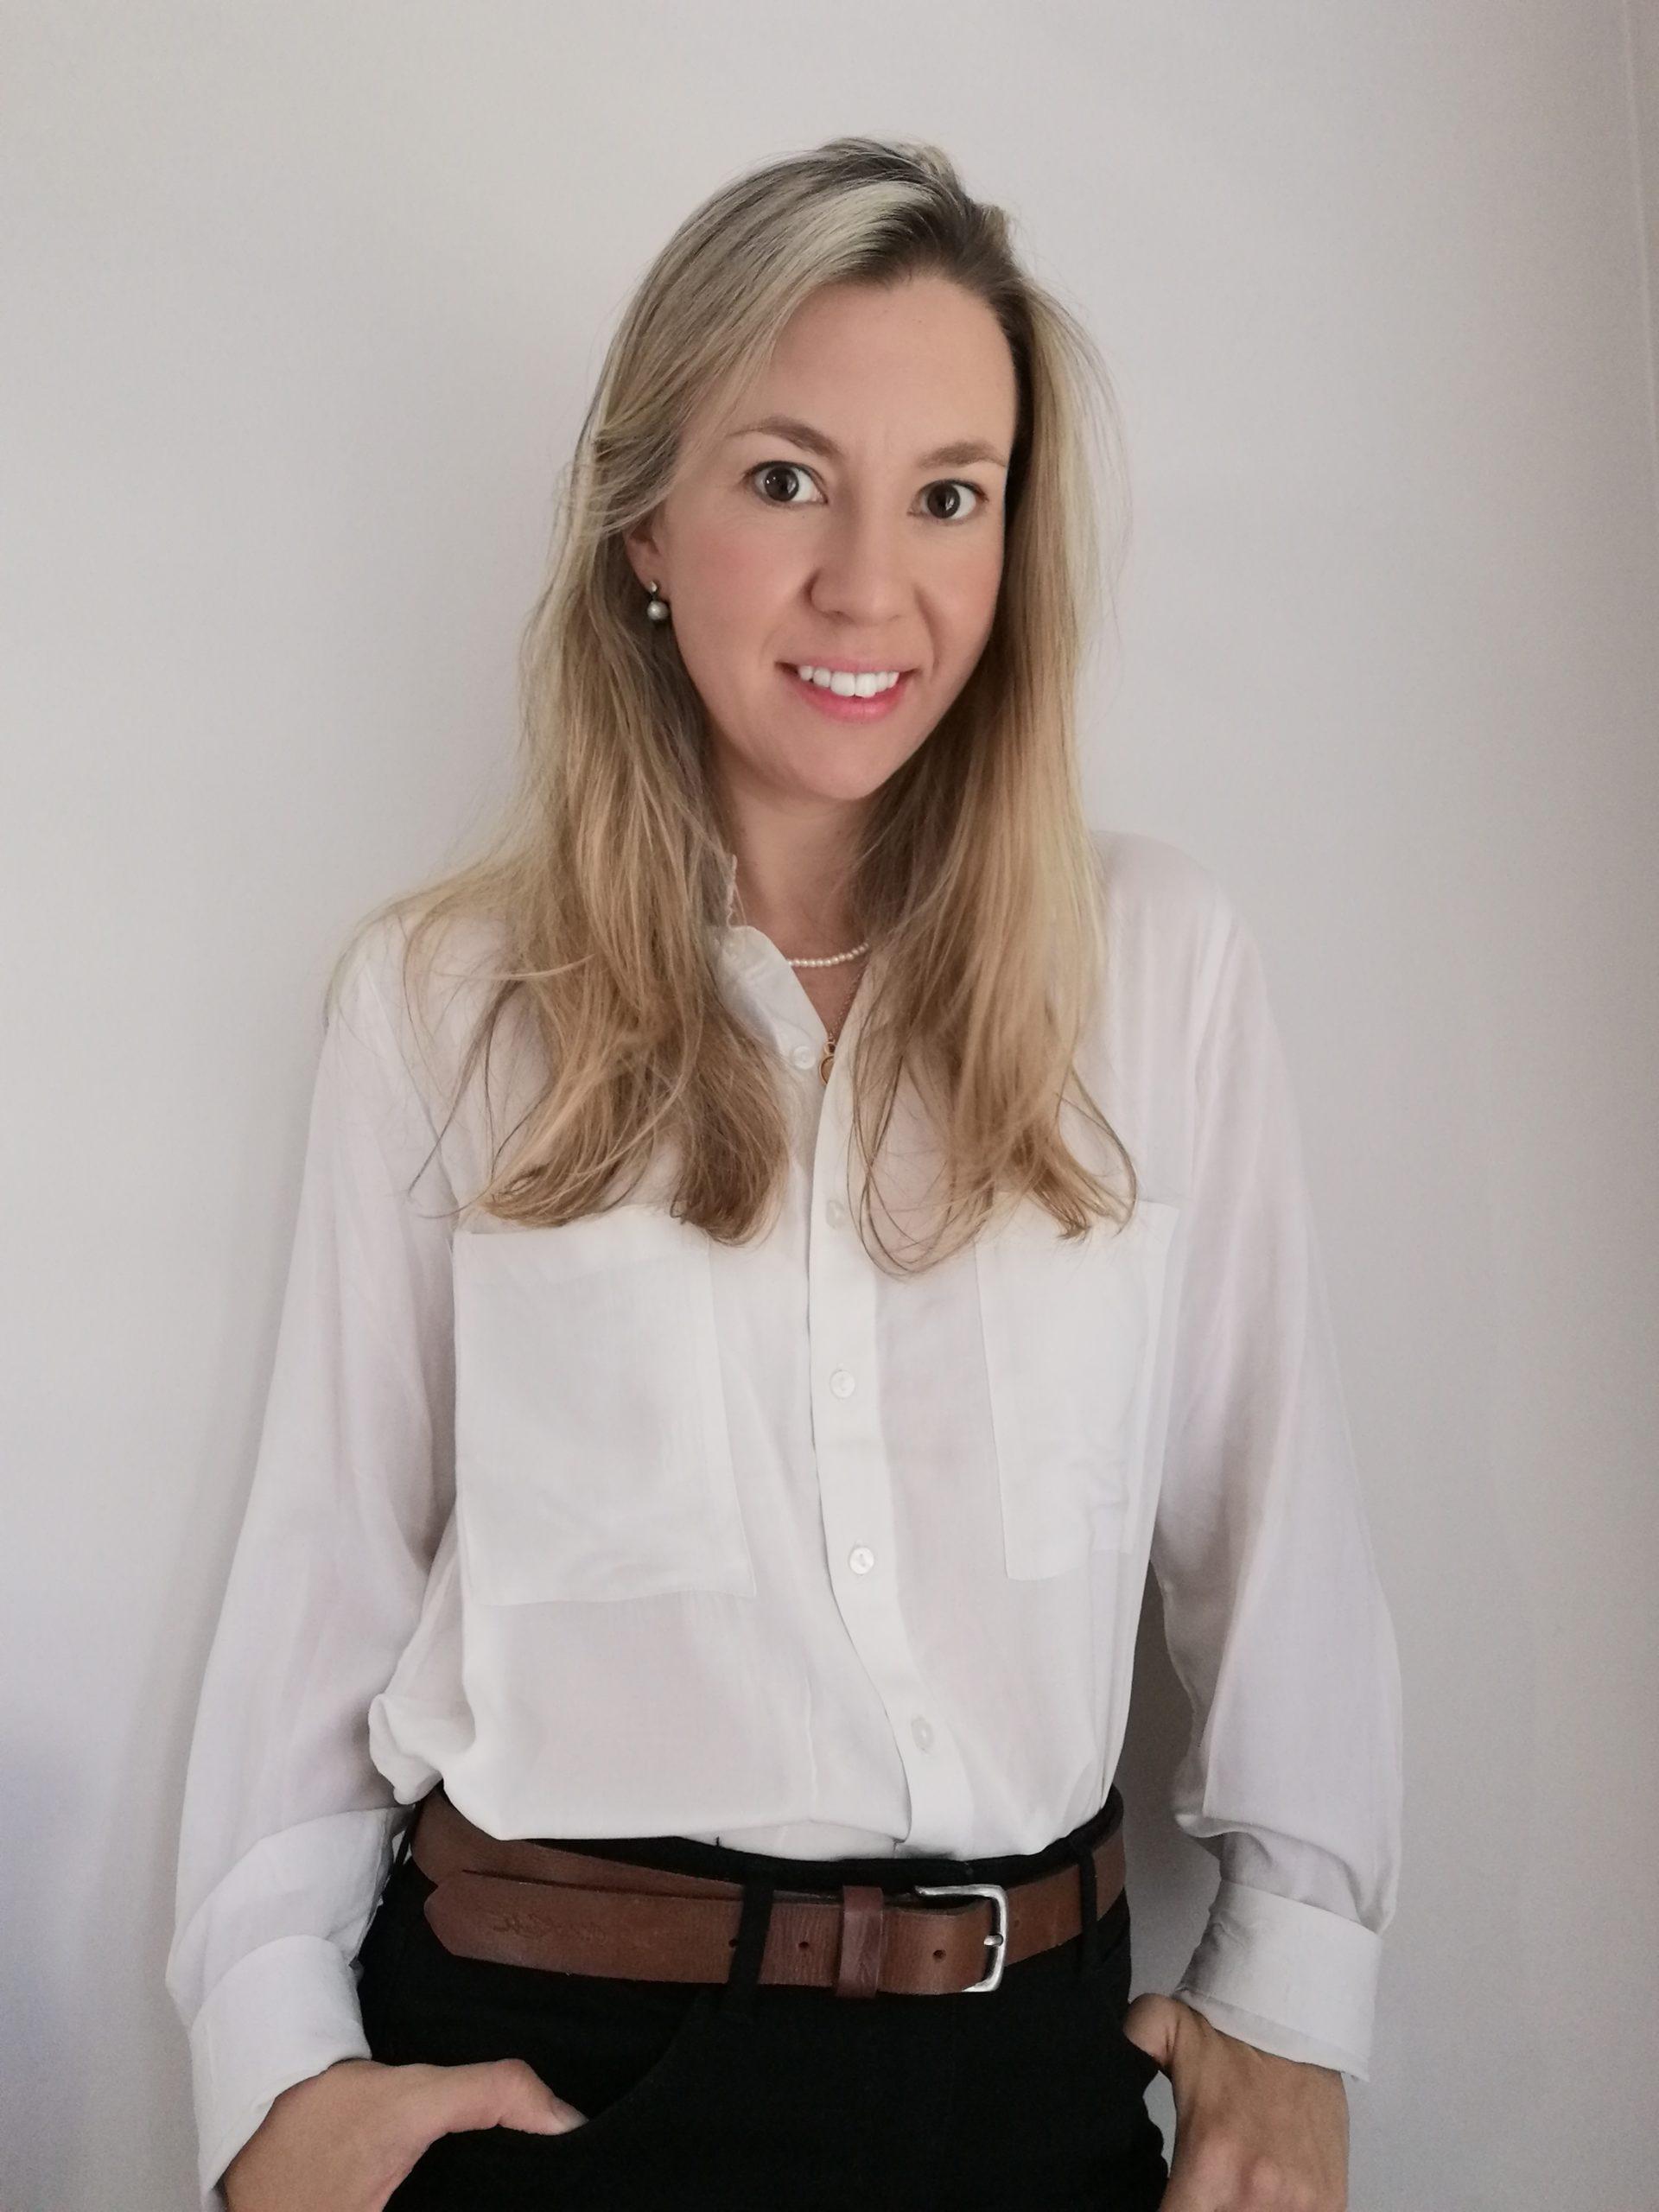 Hailey Ruthenberg